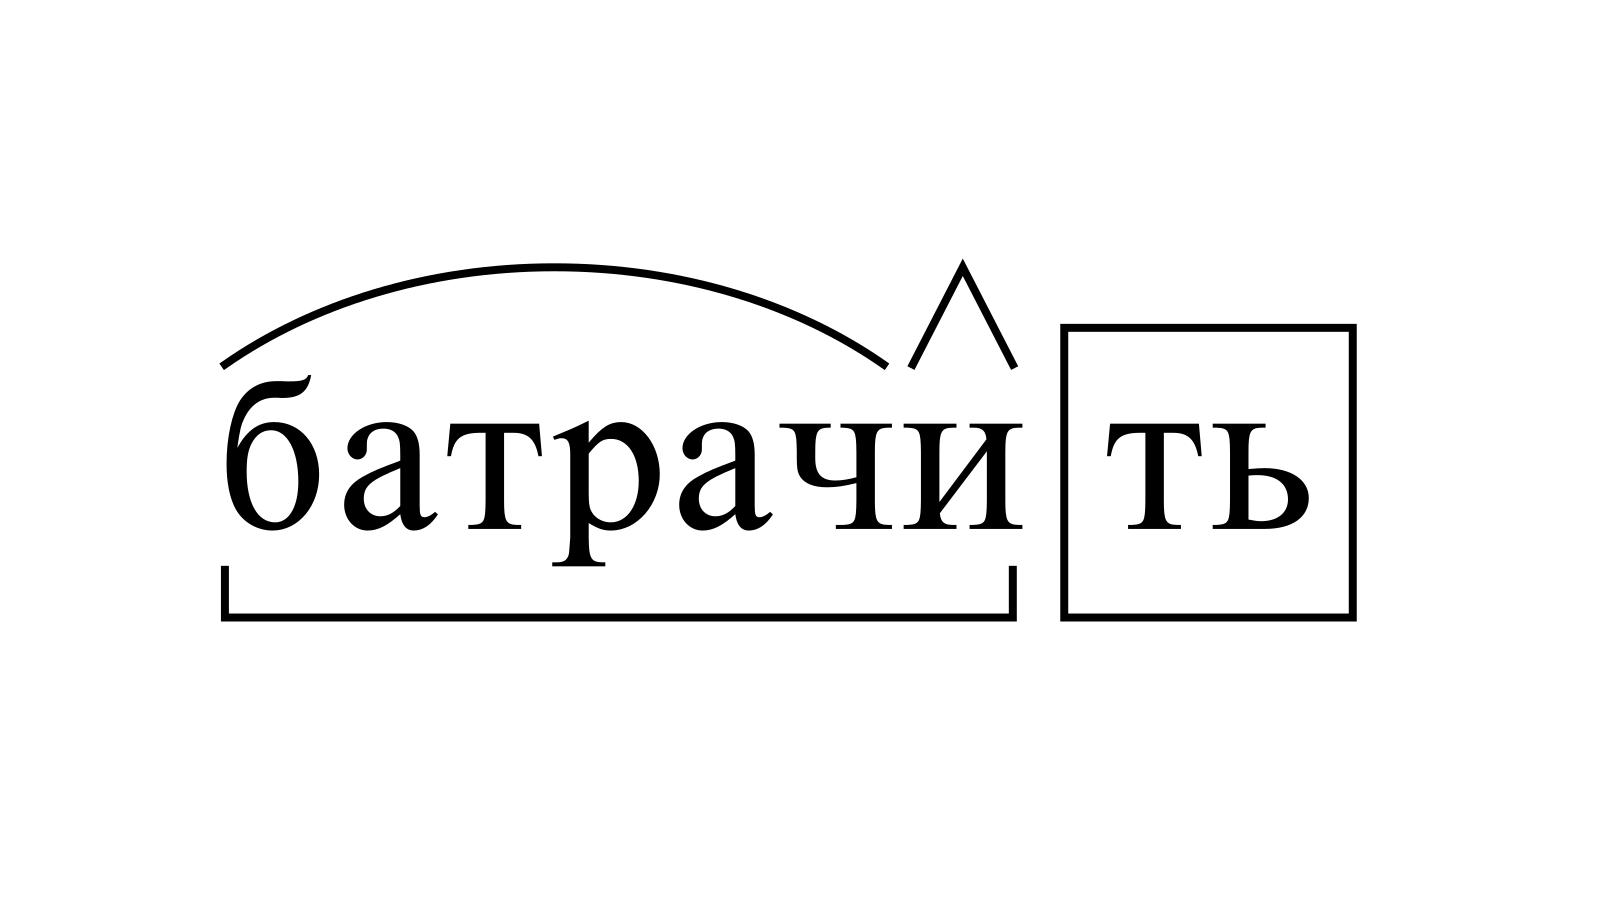 Разбор слова «батрачить» по составу